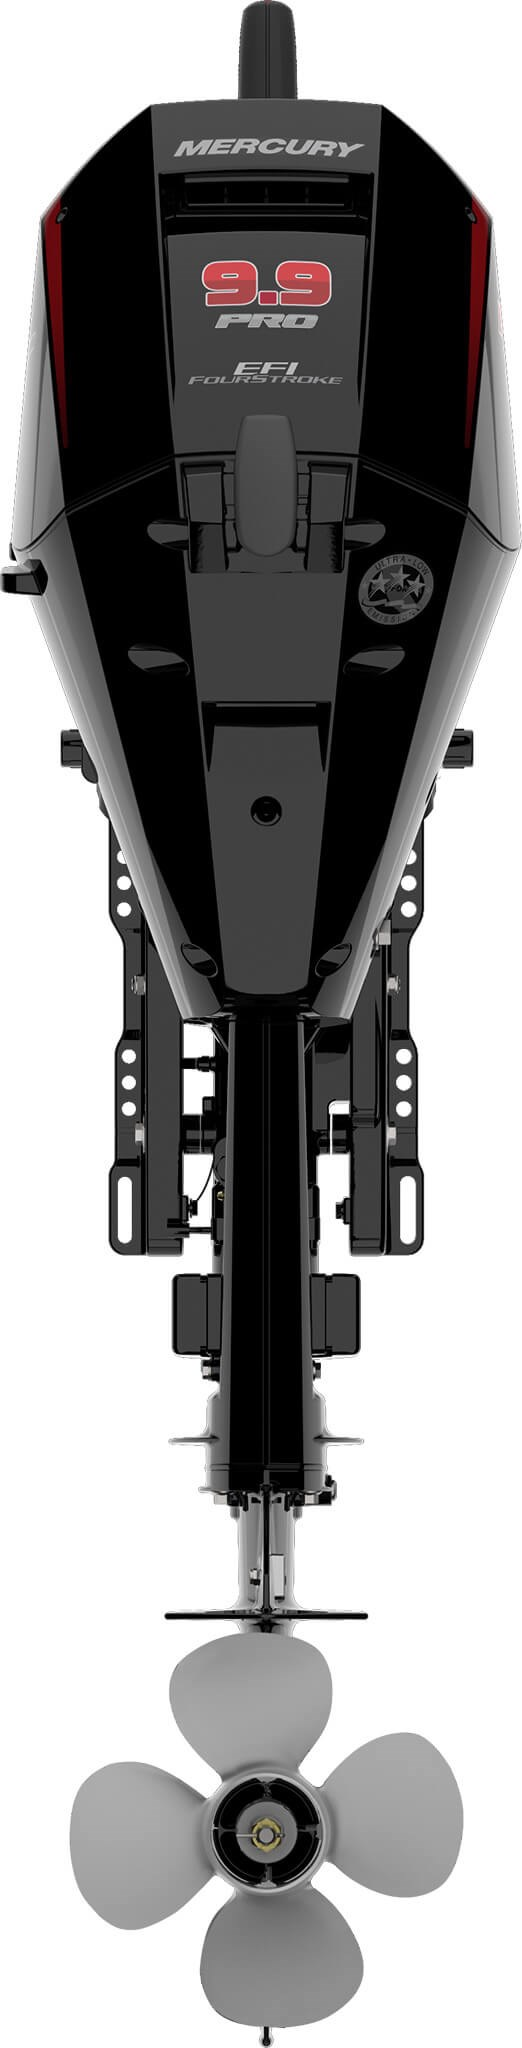 2022 Mercury 9.9ELHPT COMMAND THRUST PROKICKER EFI FOURSTROKE Photo 3 sur 4